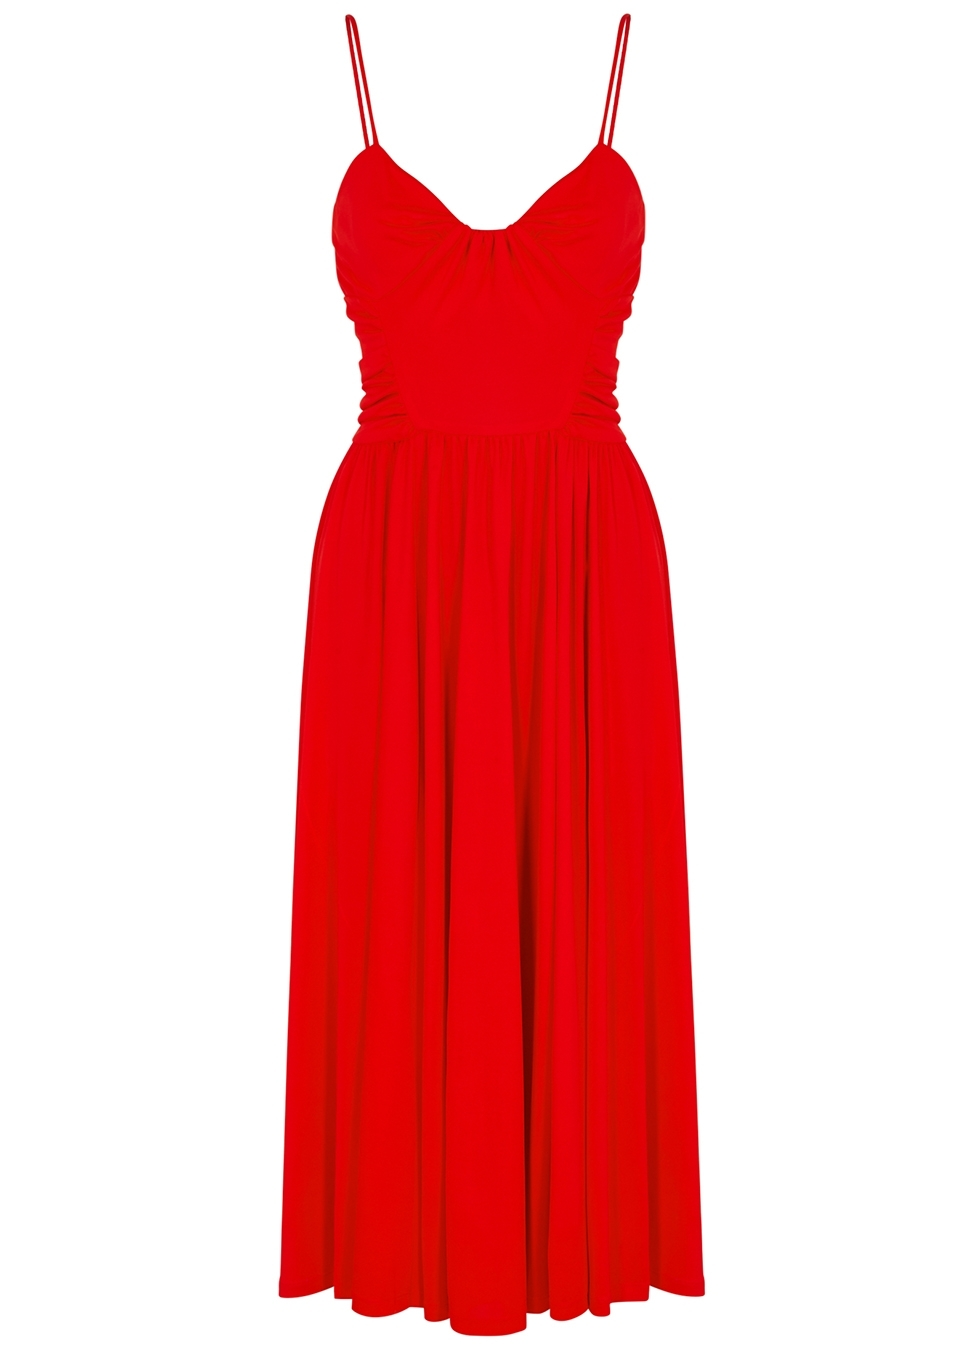 852c7f8f4541a1 Women s Designer Clothing